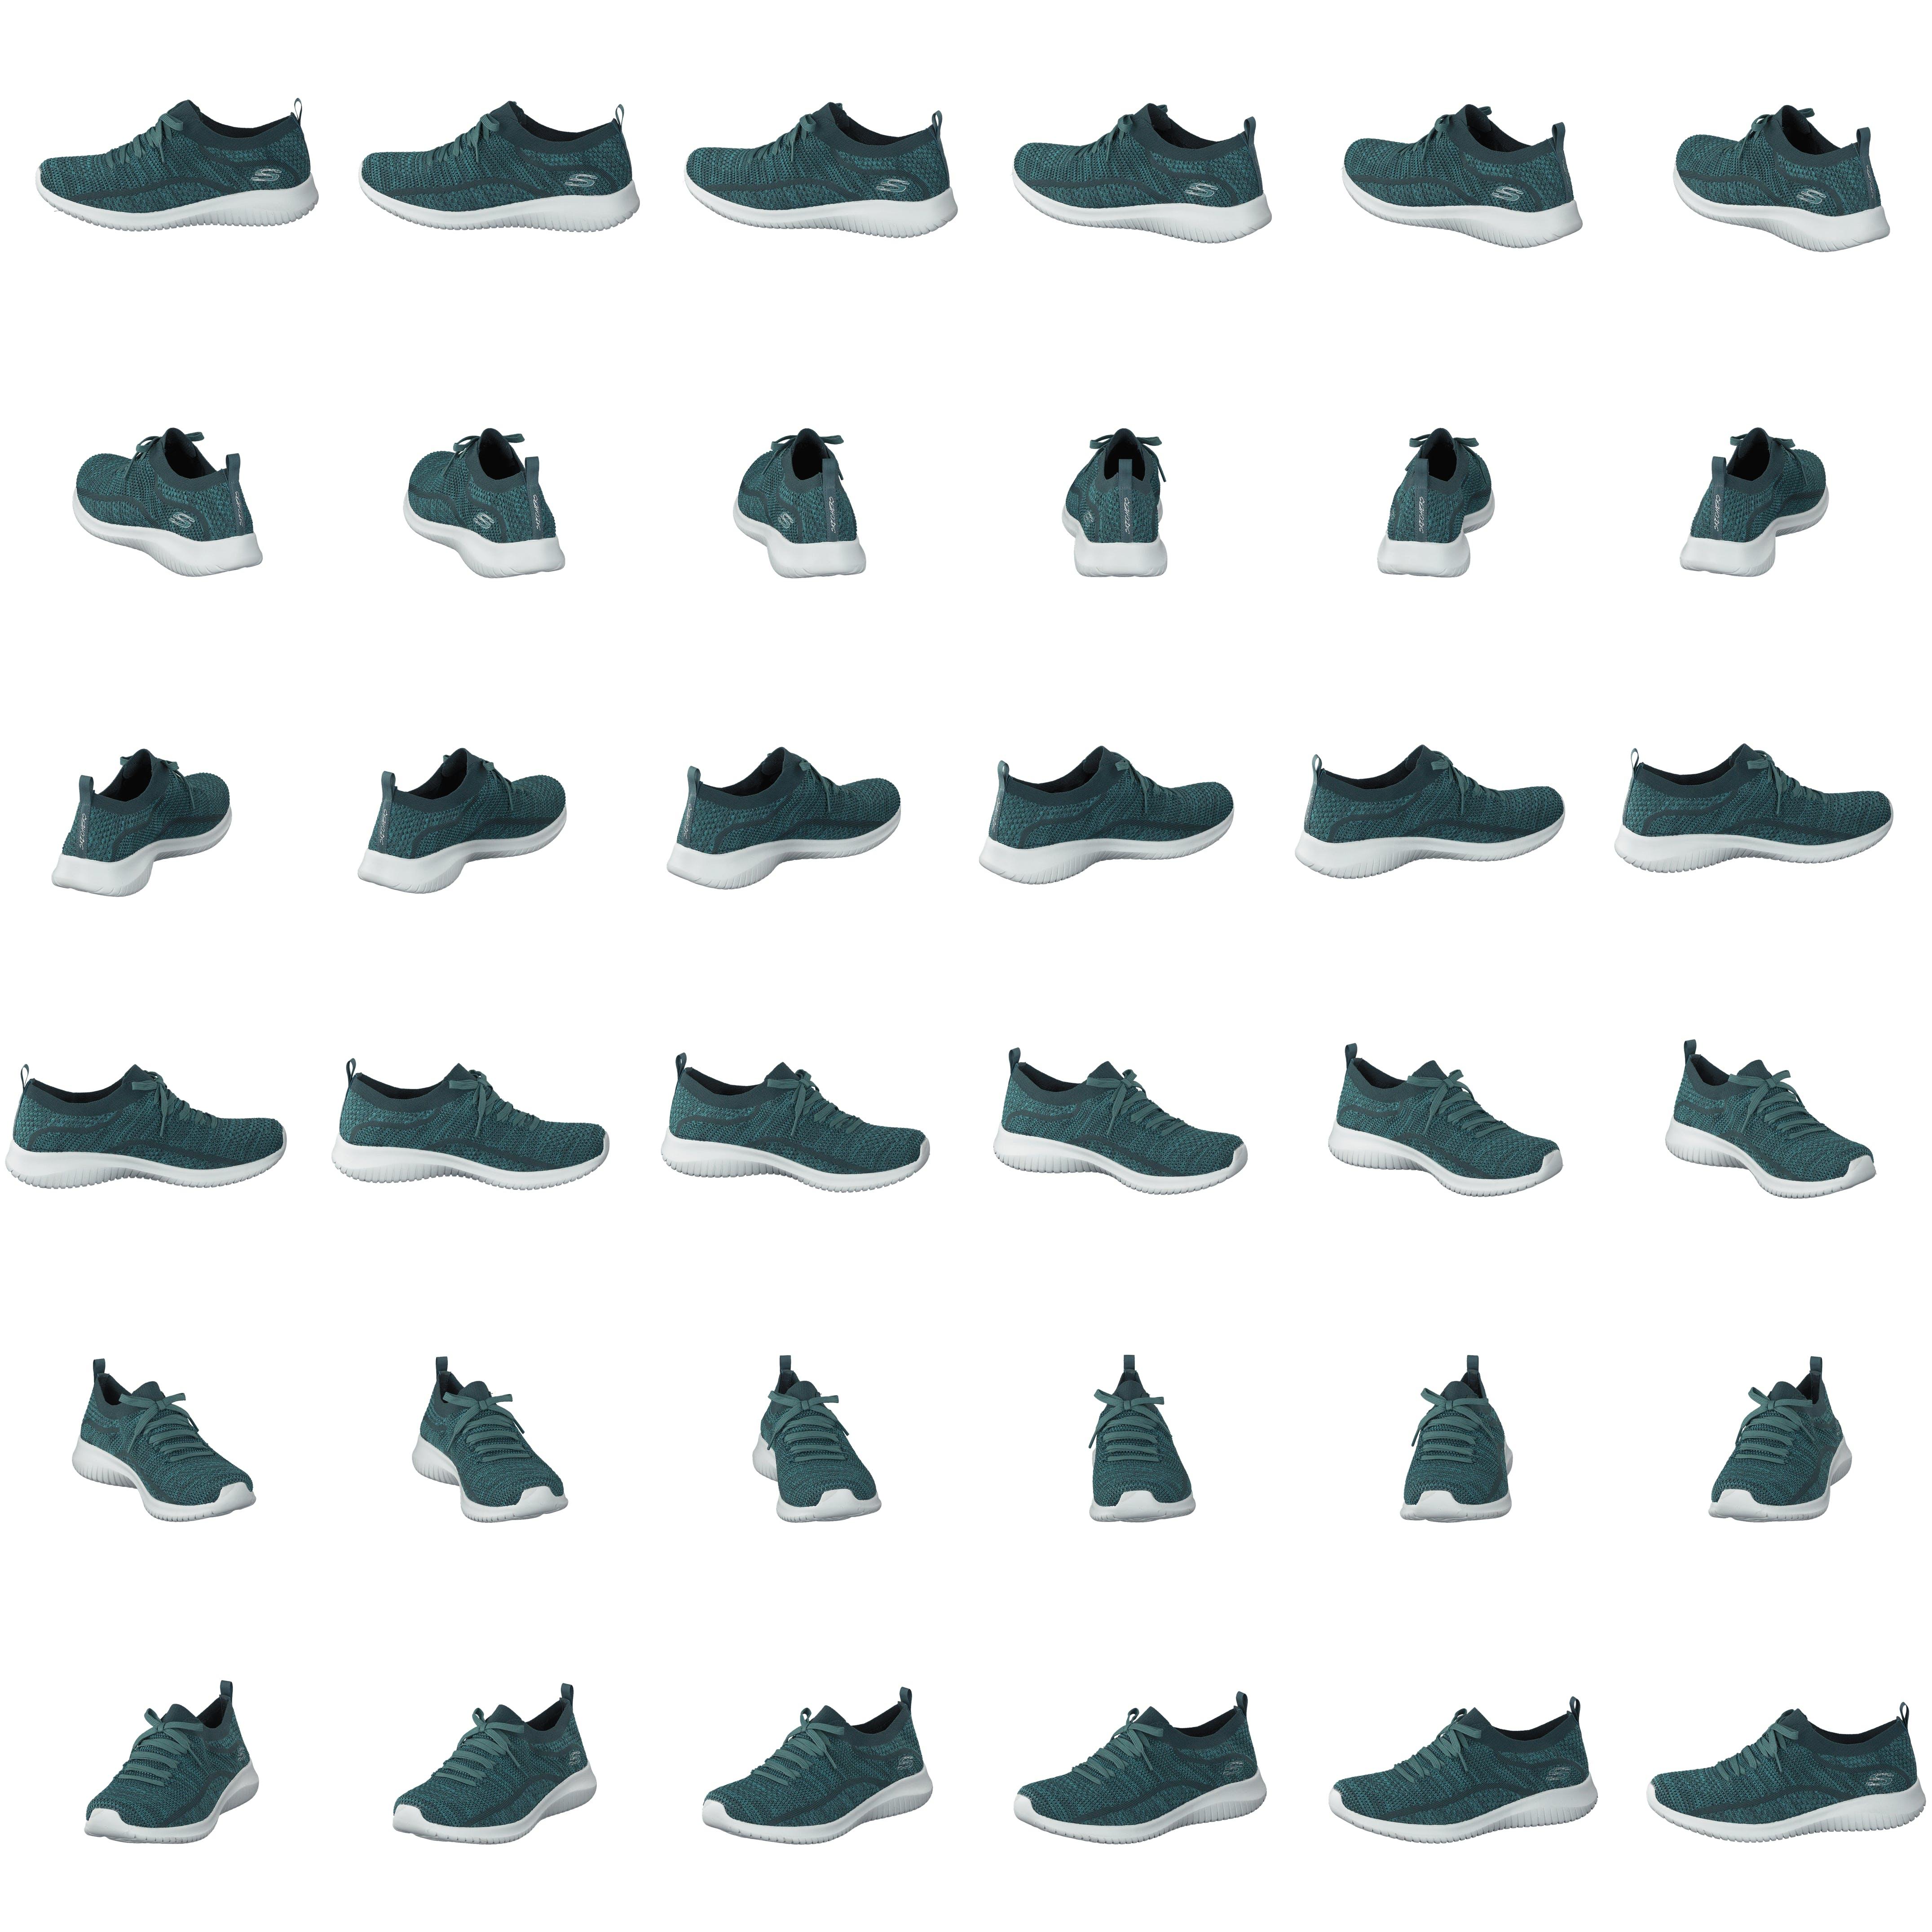 Kjøp Skechers Ultra Flex Grn sko Online | FOOTWAY.no